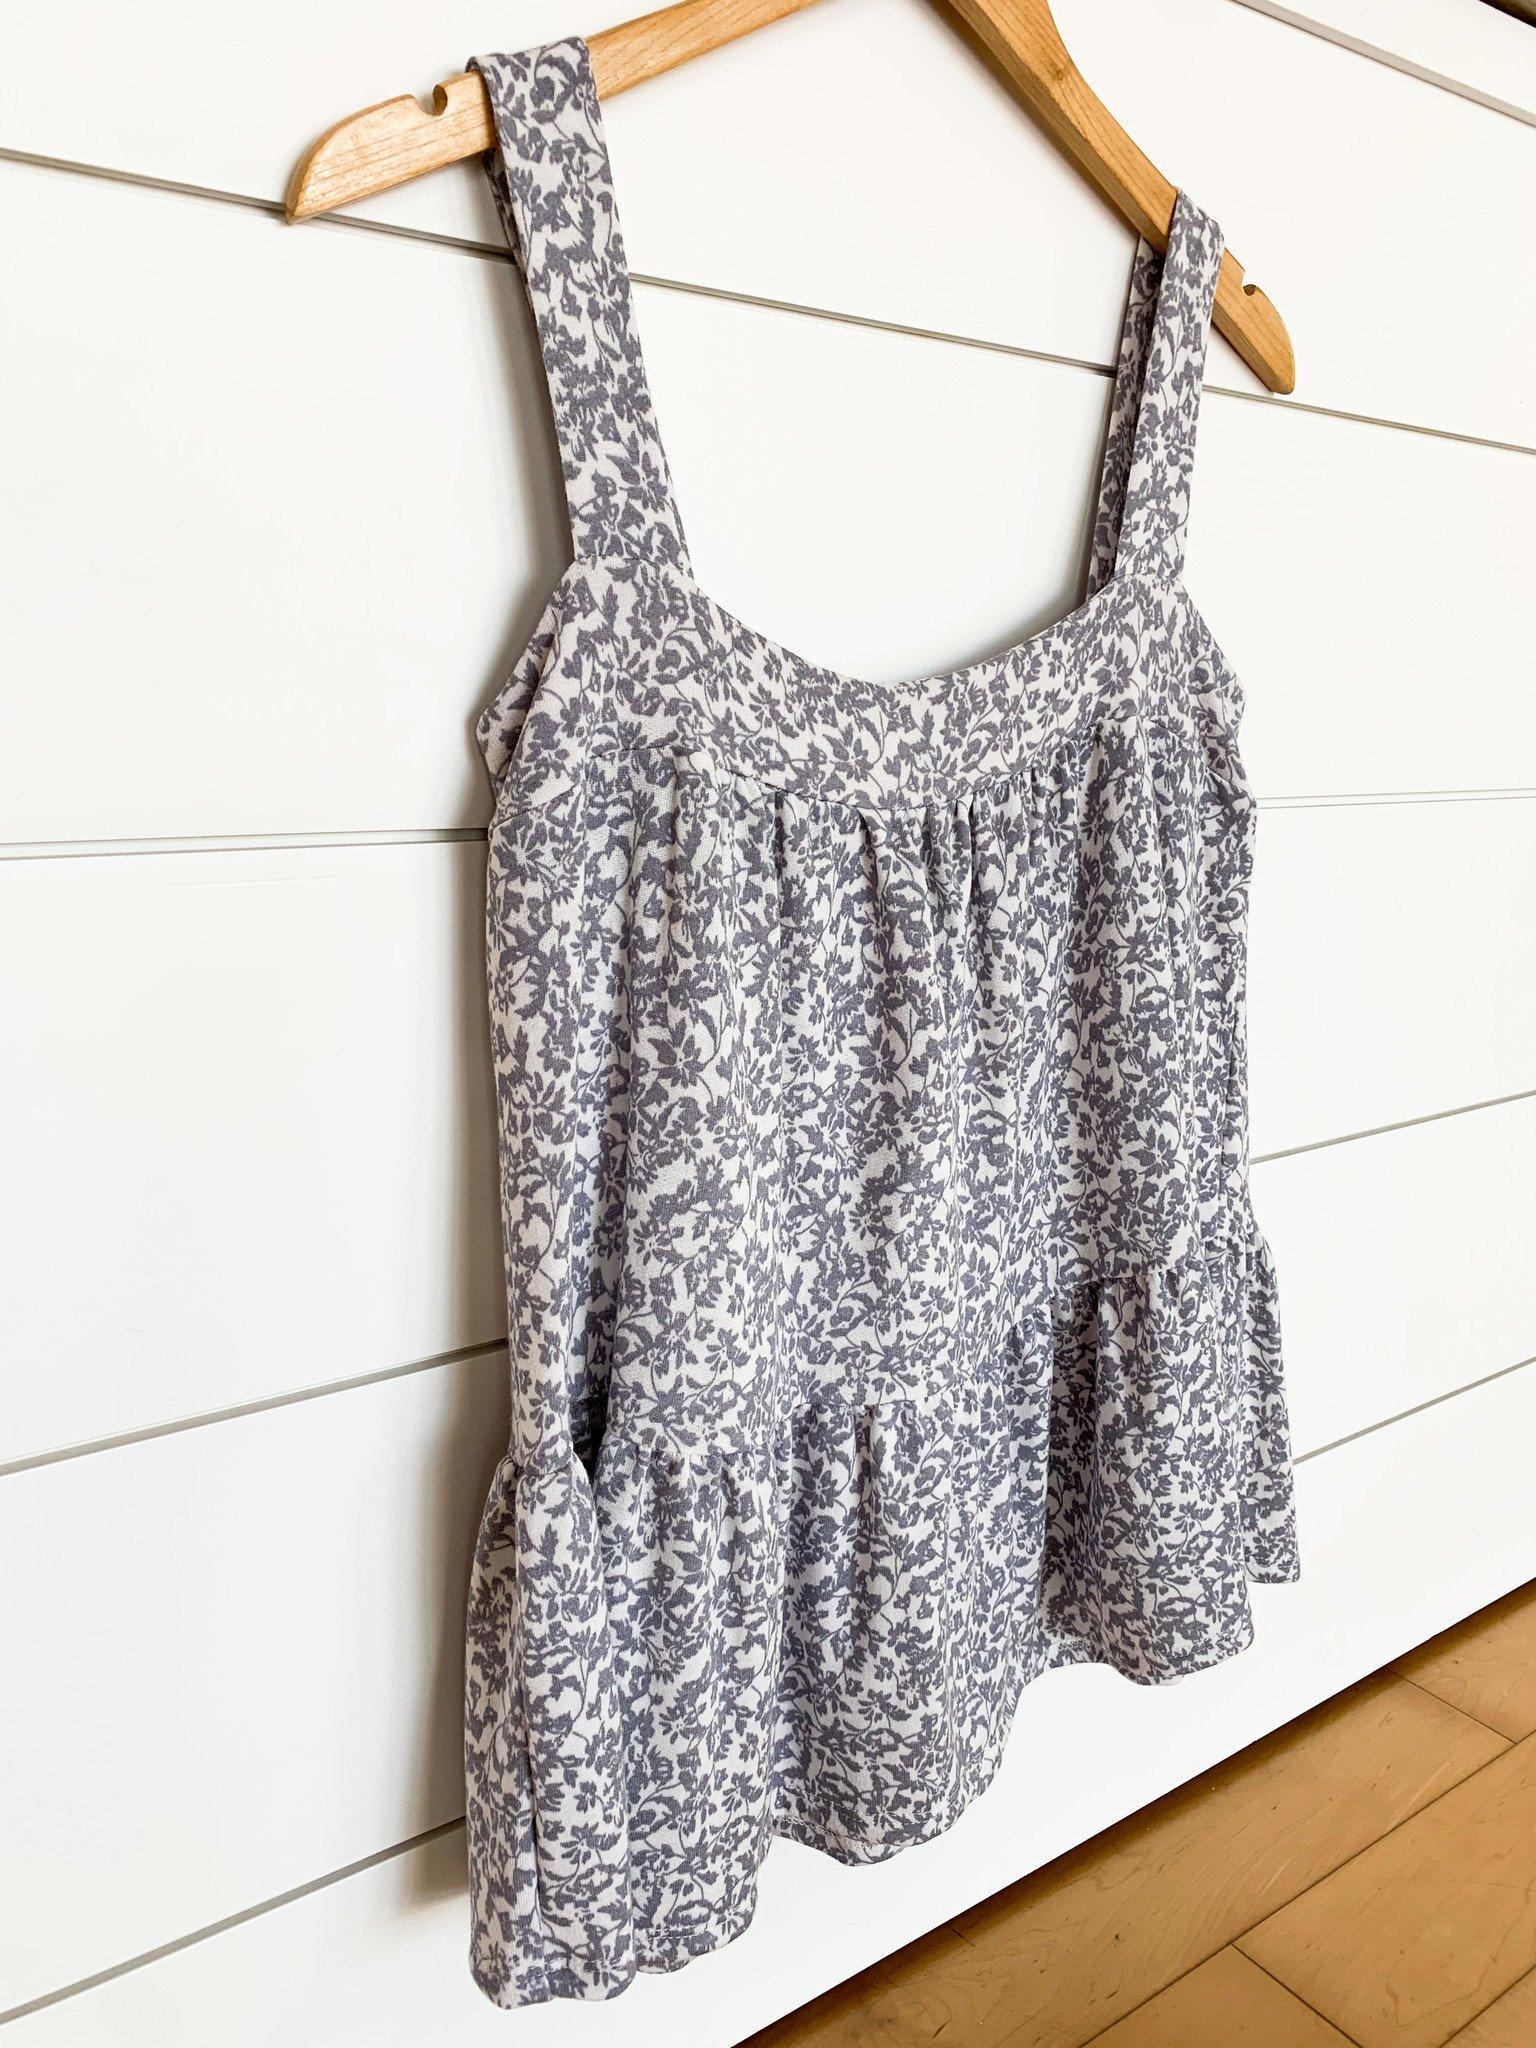 White/Light Grey Floral Print Top